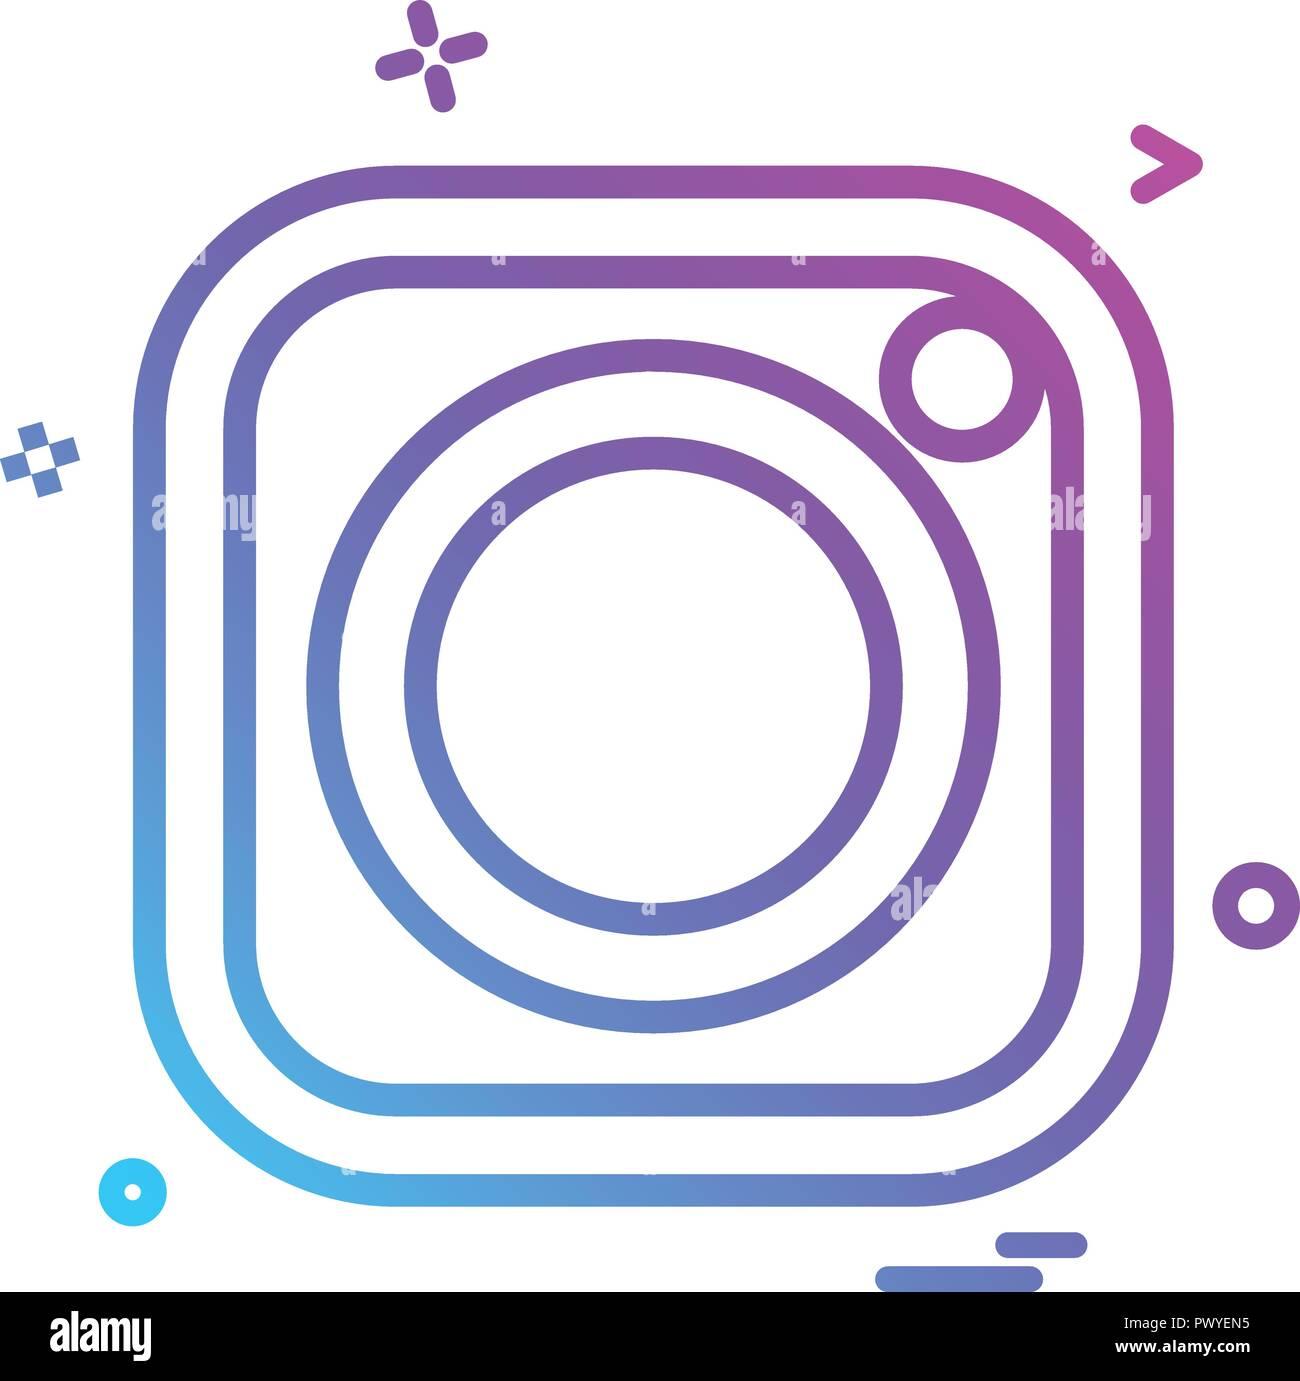 Vector Illustration Instagram: Instagram App Cut Out Stock Images & Pictures